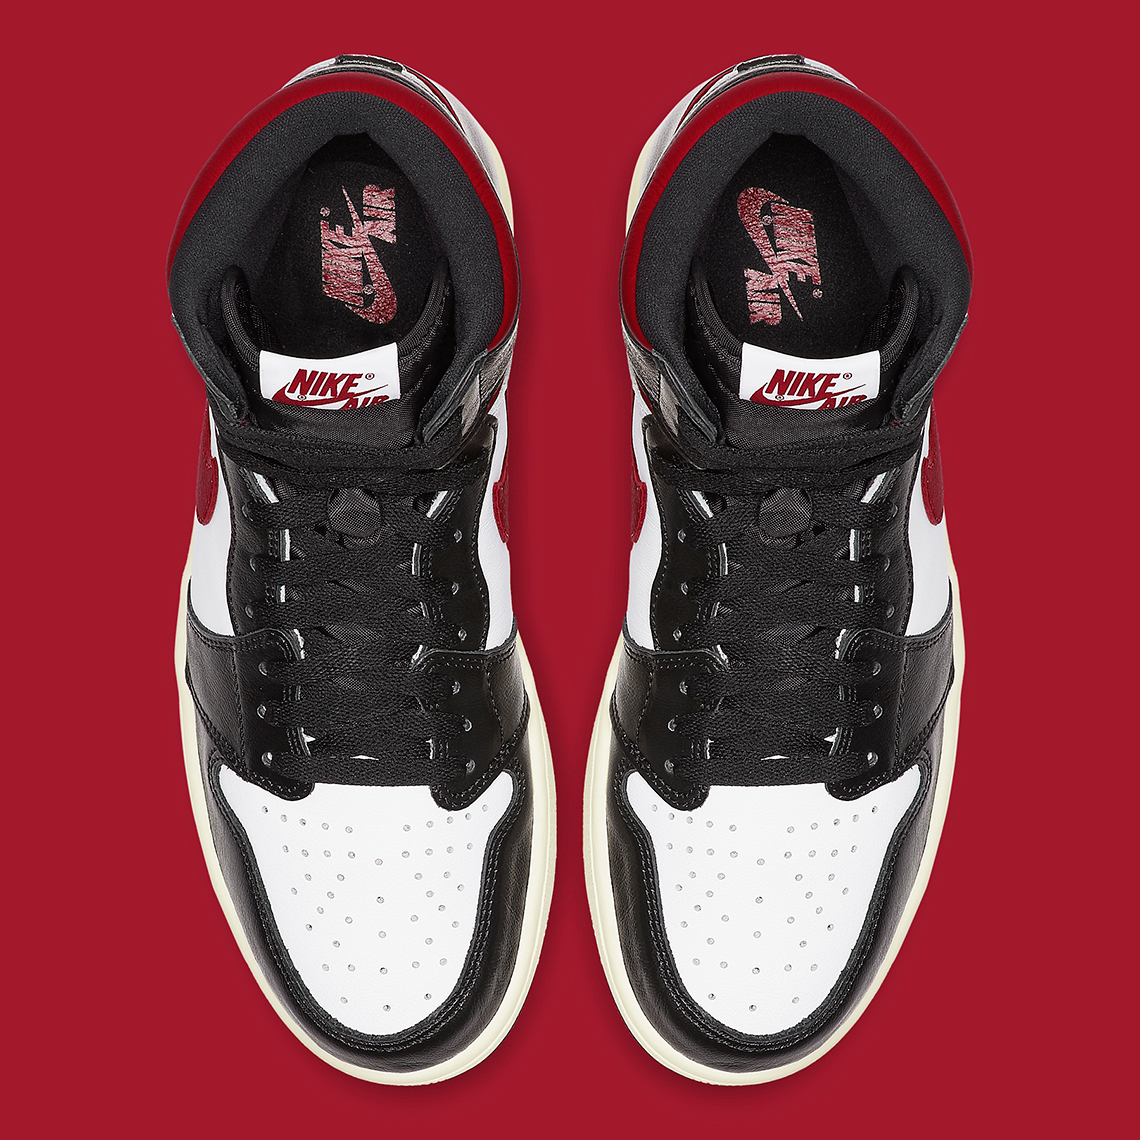 0f13b484 Jordan 1 Gym Red 555088-061 Release Date   SneakerNews.com